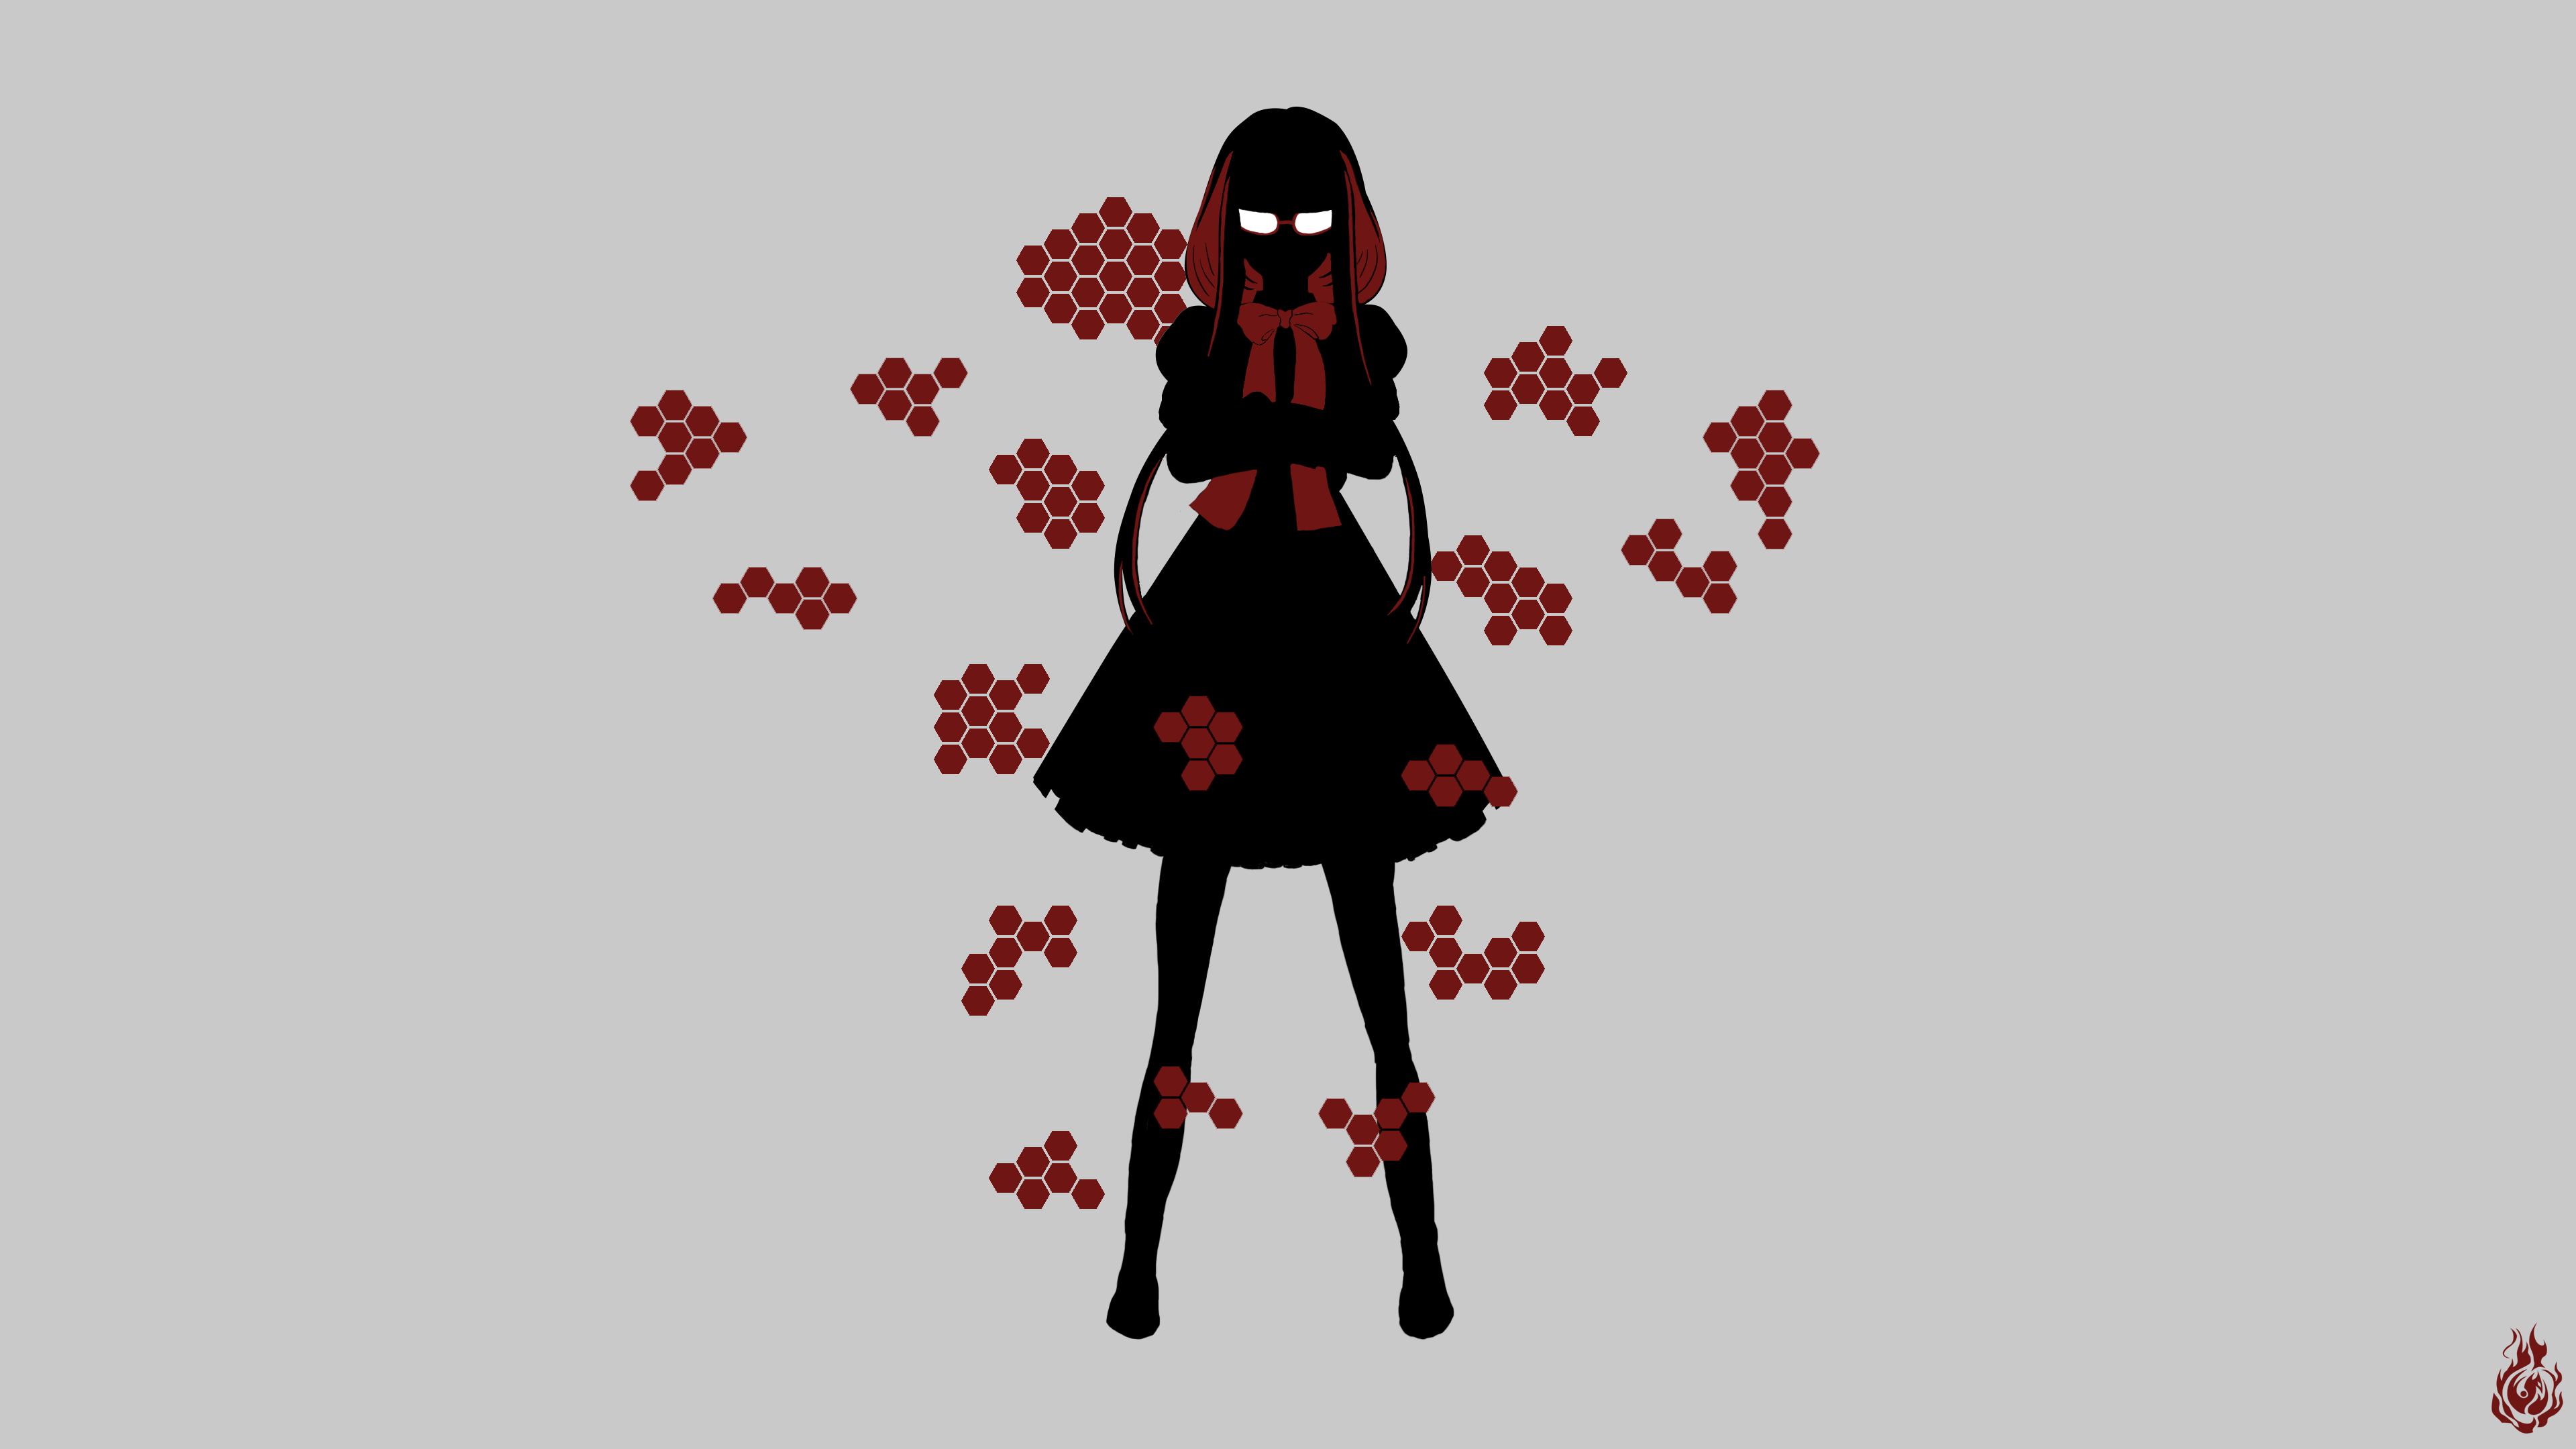 http://orig10.deviantart.net/754f/f/2015/271/c/6/hiei_minimalism_wallpaper_by_ayork-d9b8q7z.png